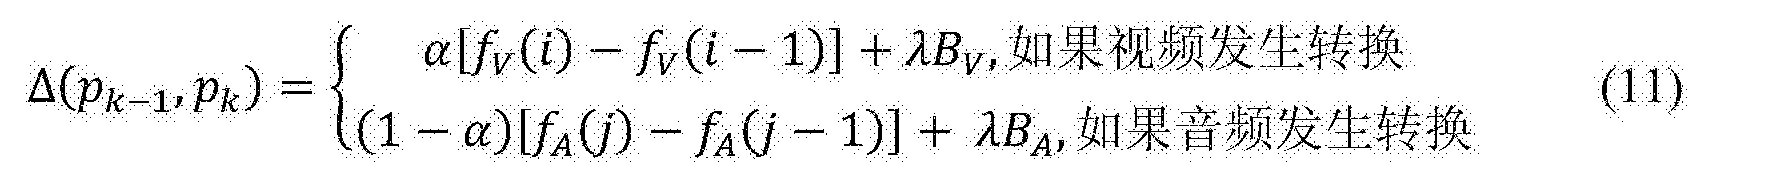 Figure CN106407268AD00104